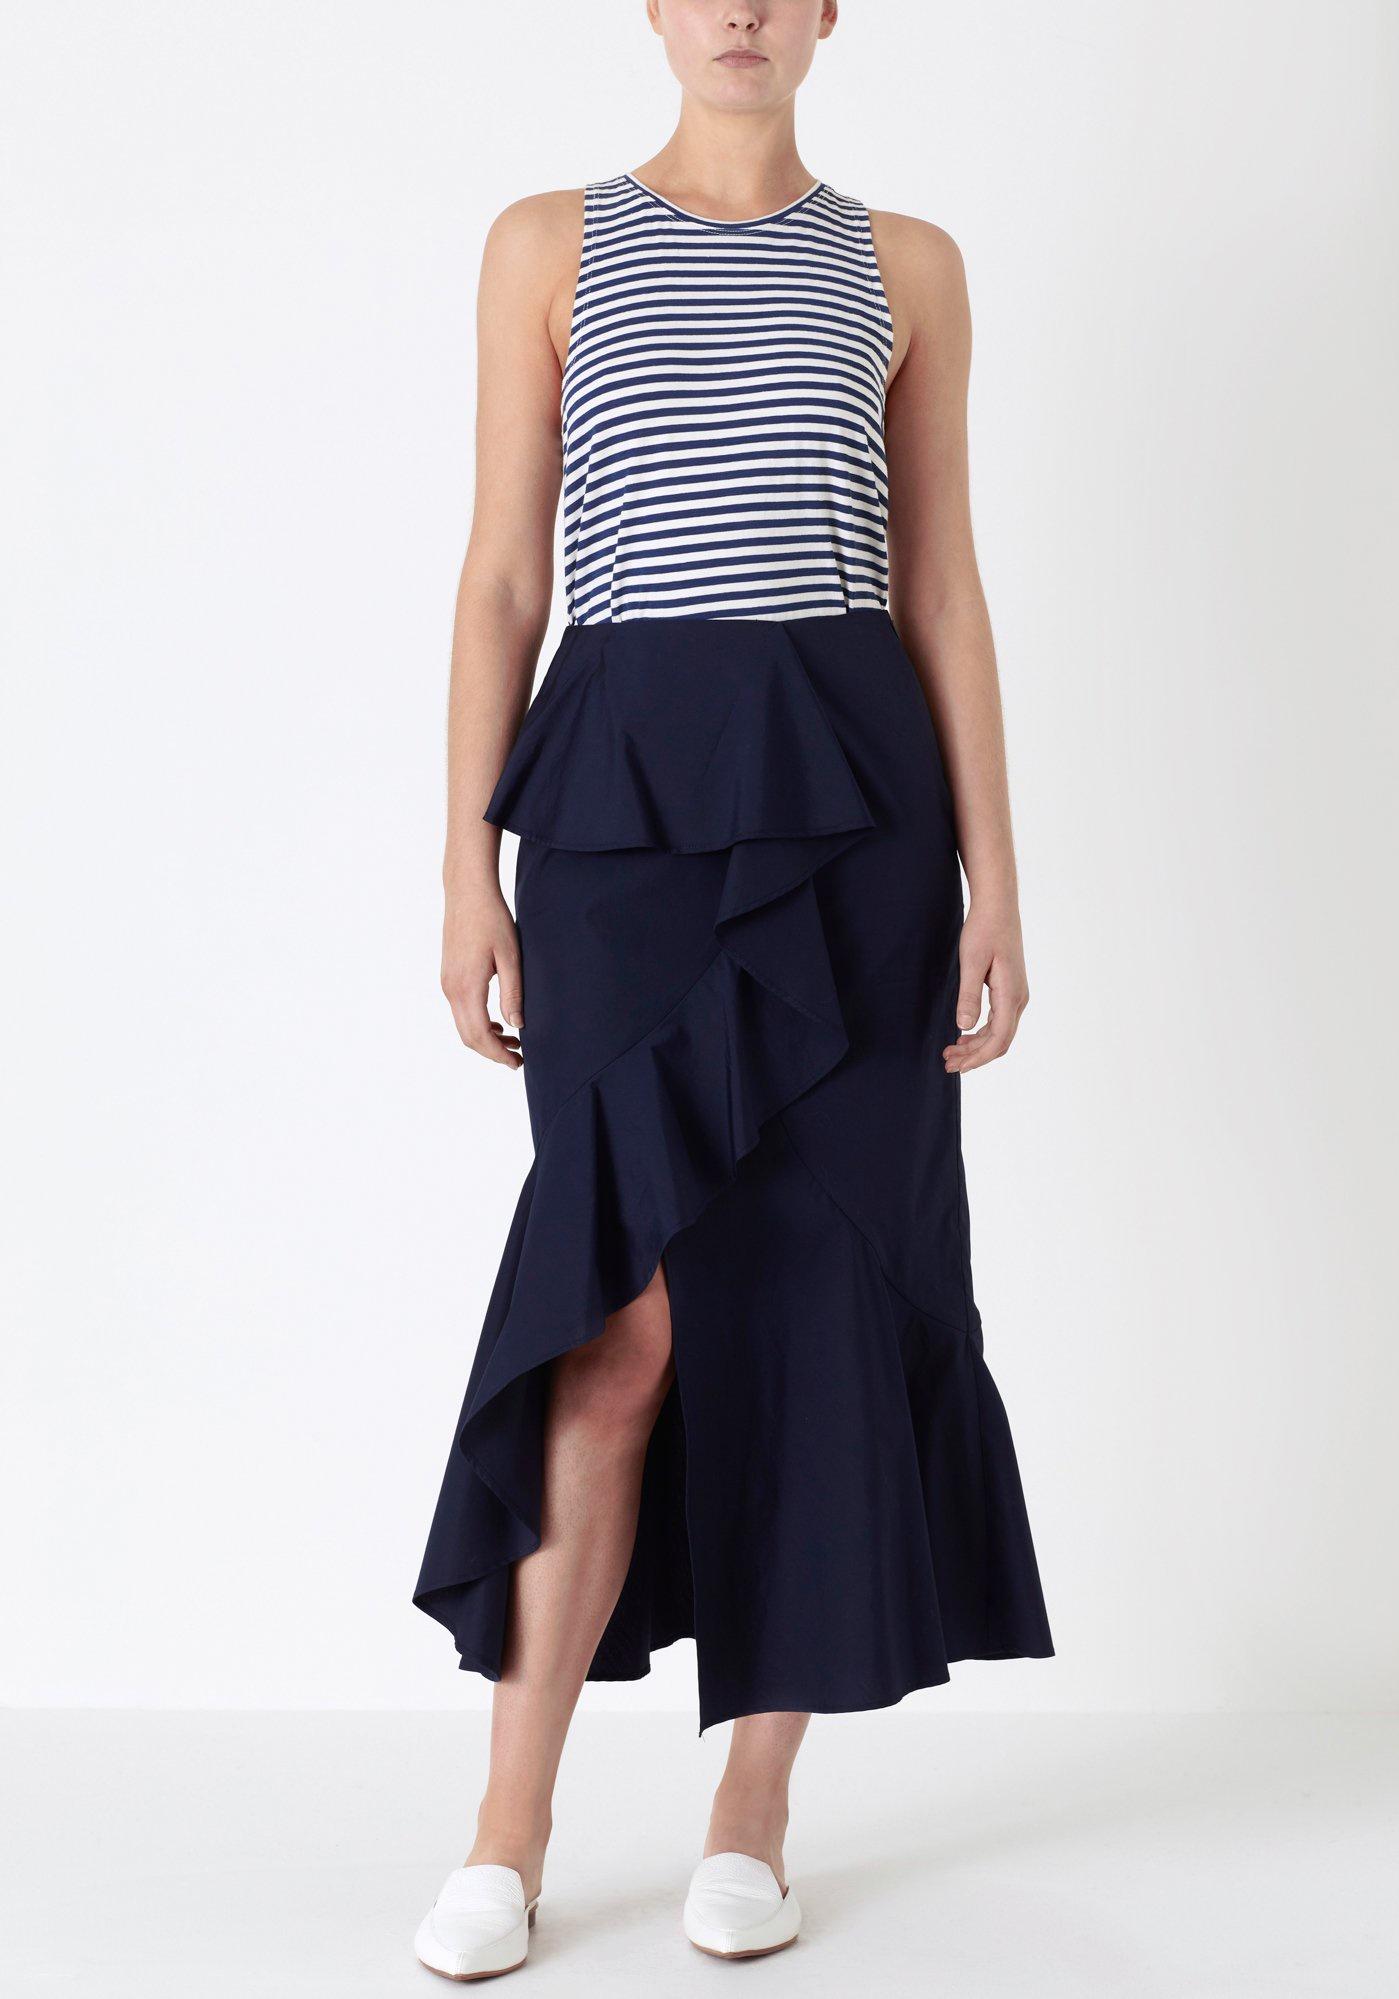 Viktoria & Woods Istanbul Skirt